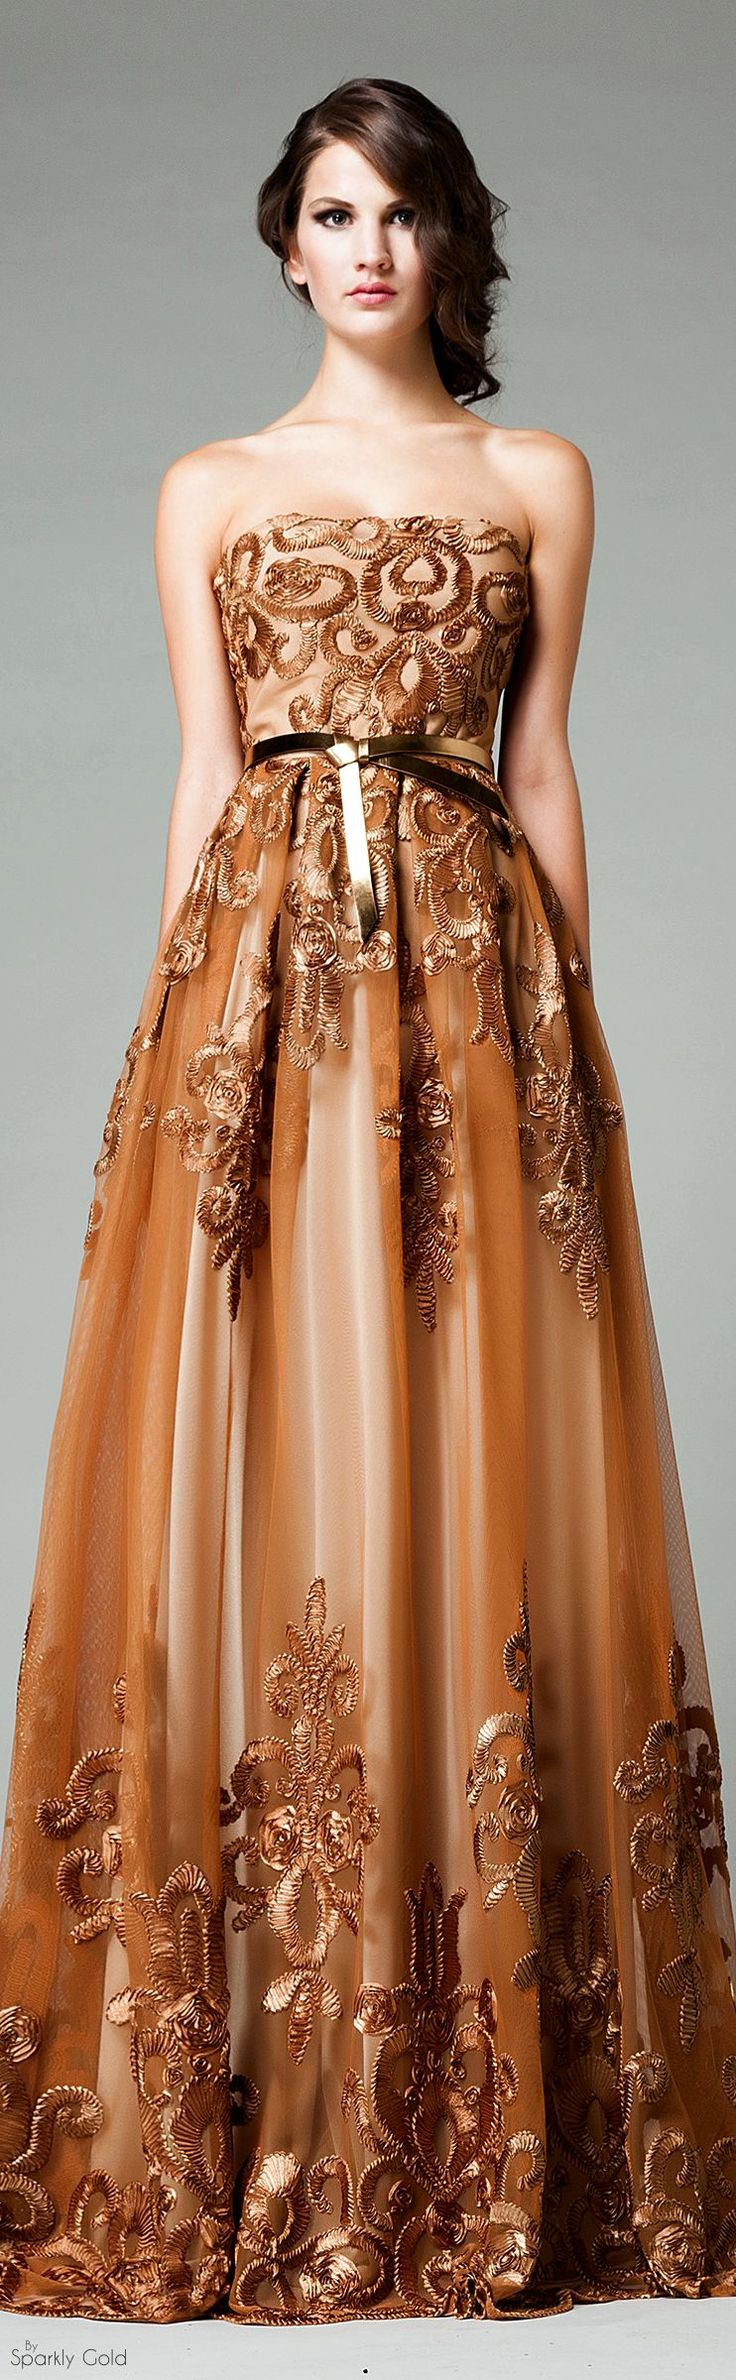 esbeda bags price Veloudakis Fall 2015 | Dress Me Up |  | Ux/ui Designer and Gold